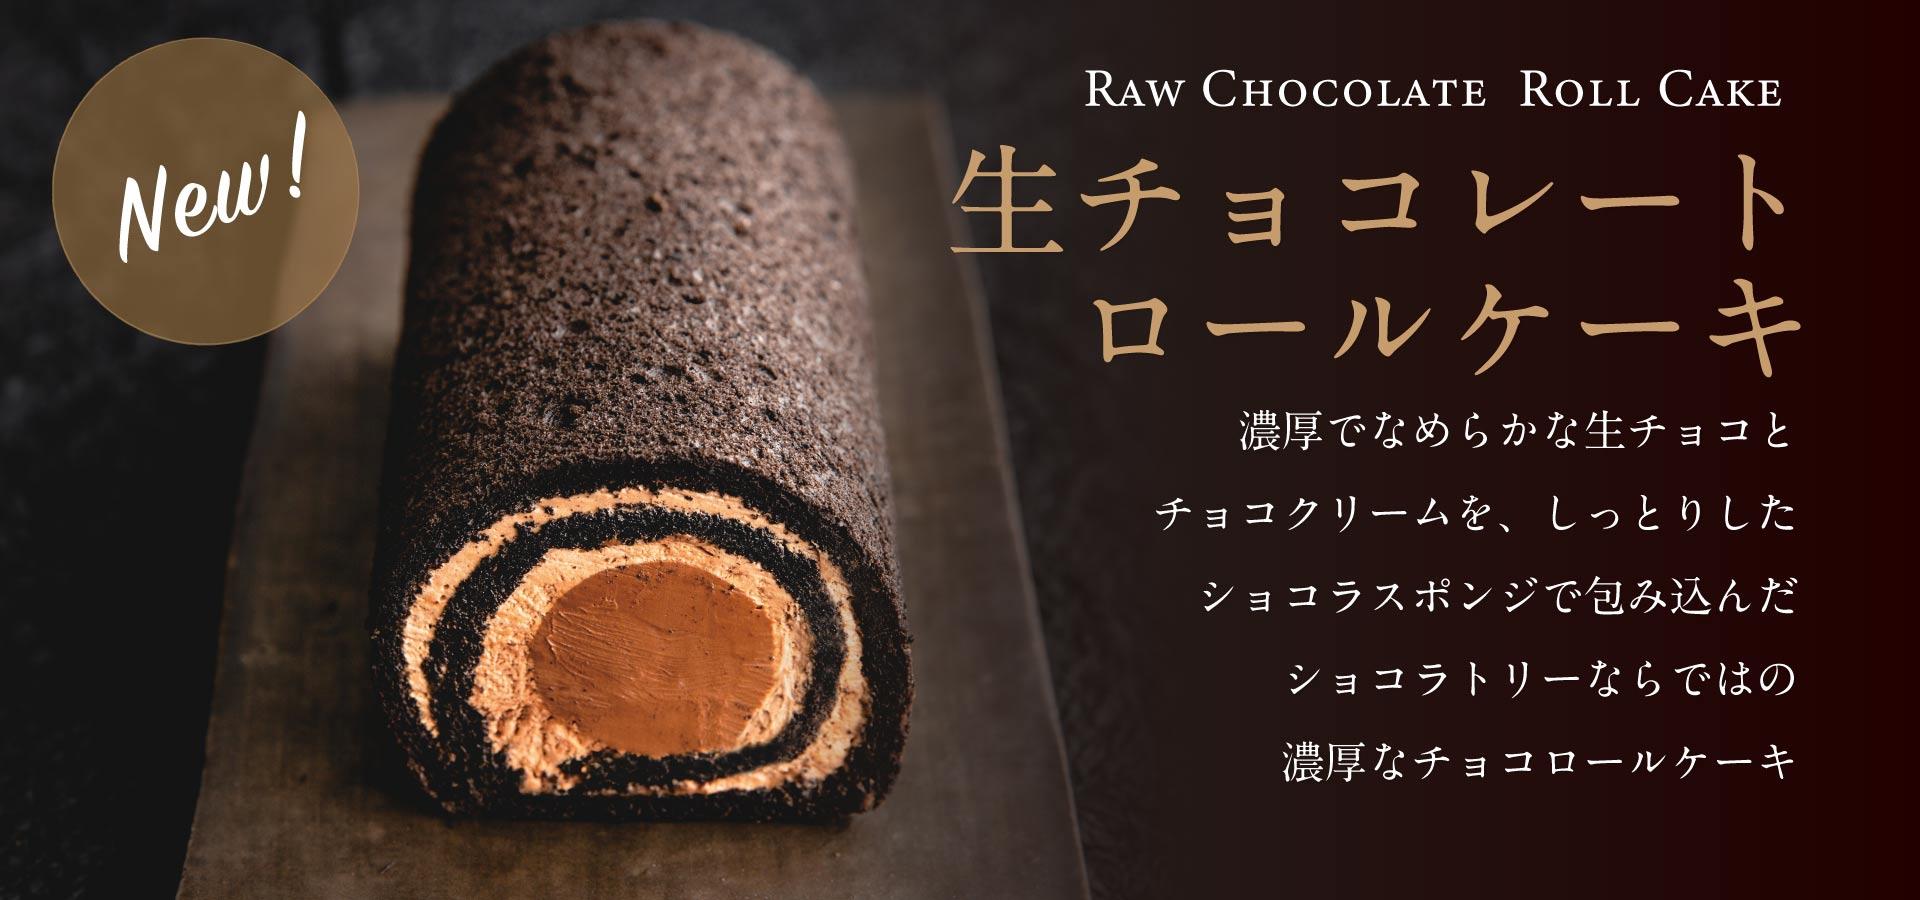 Casual Chocolate/カジュアルショコラ